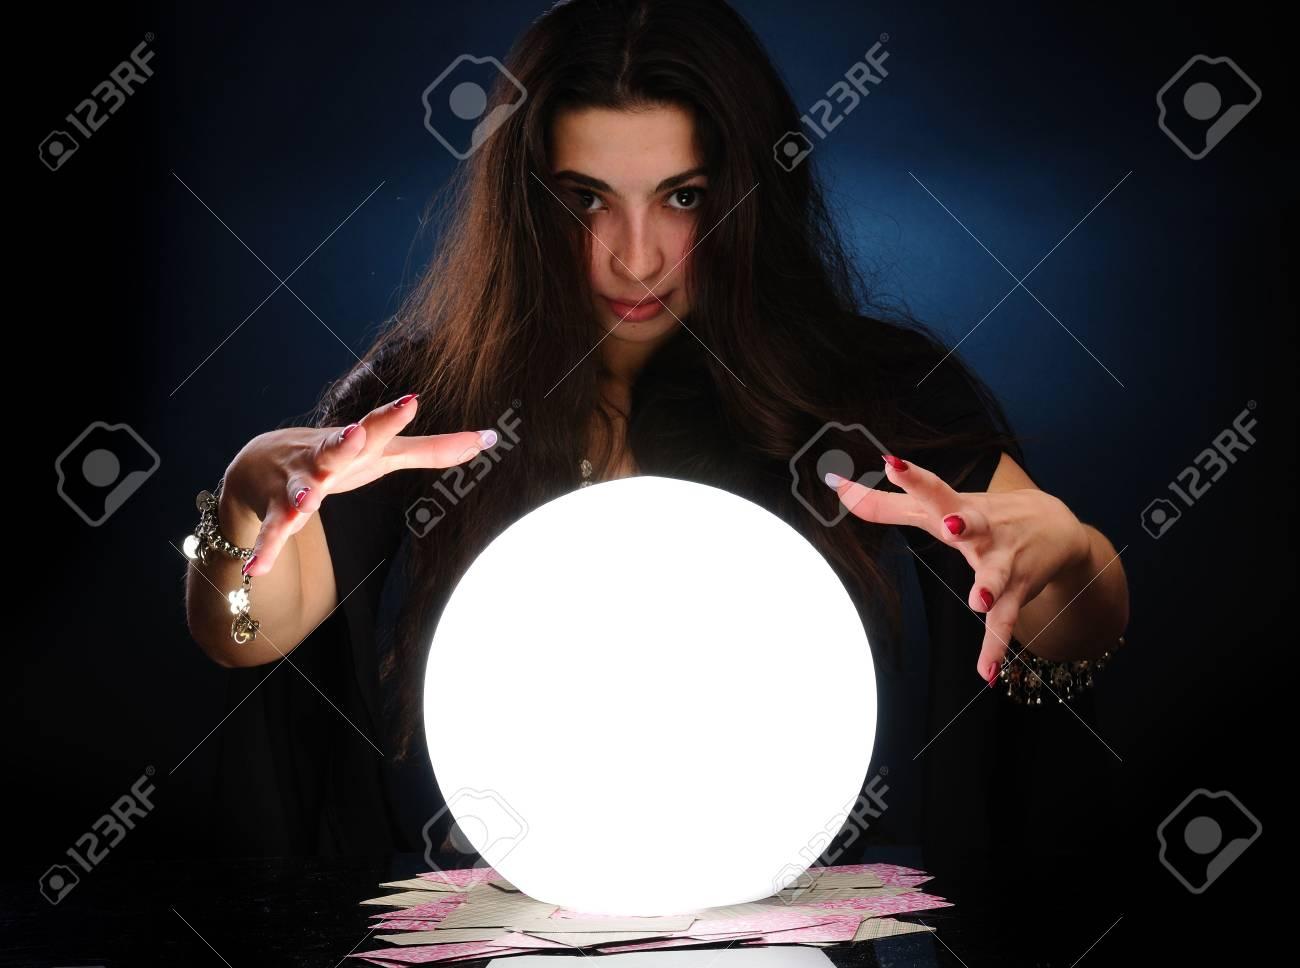 Fortuneteller at work Stock Photo - 6086828